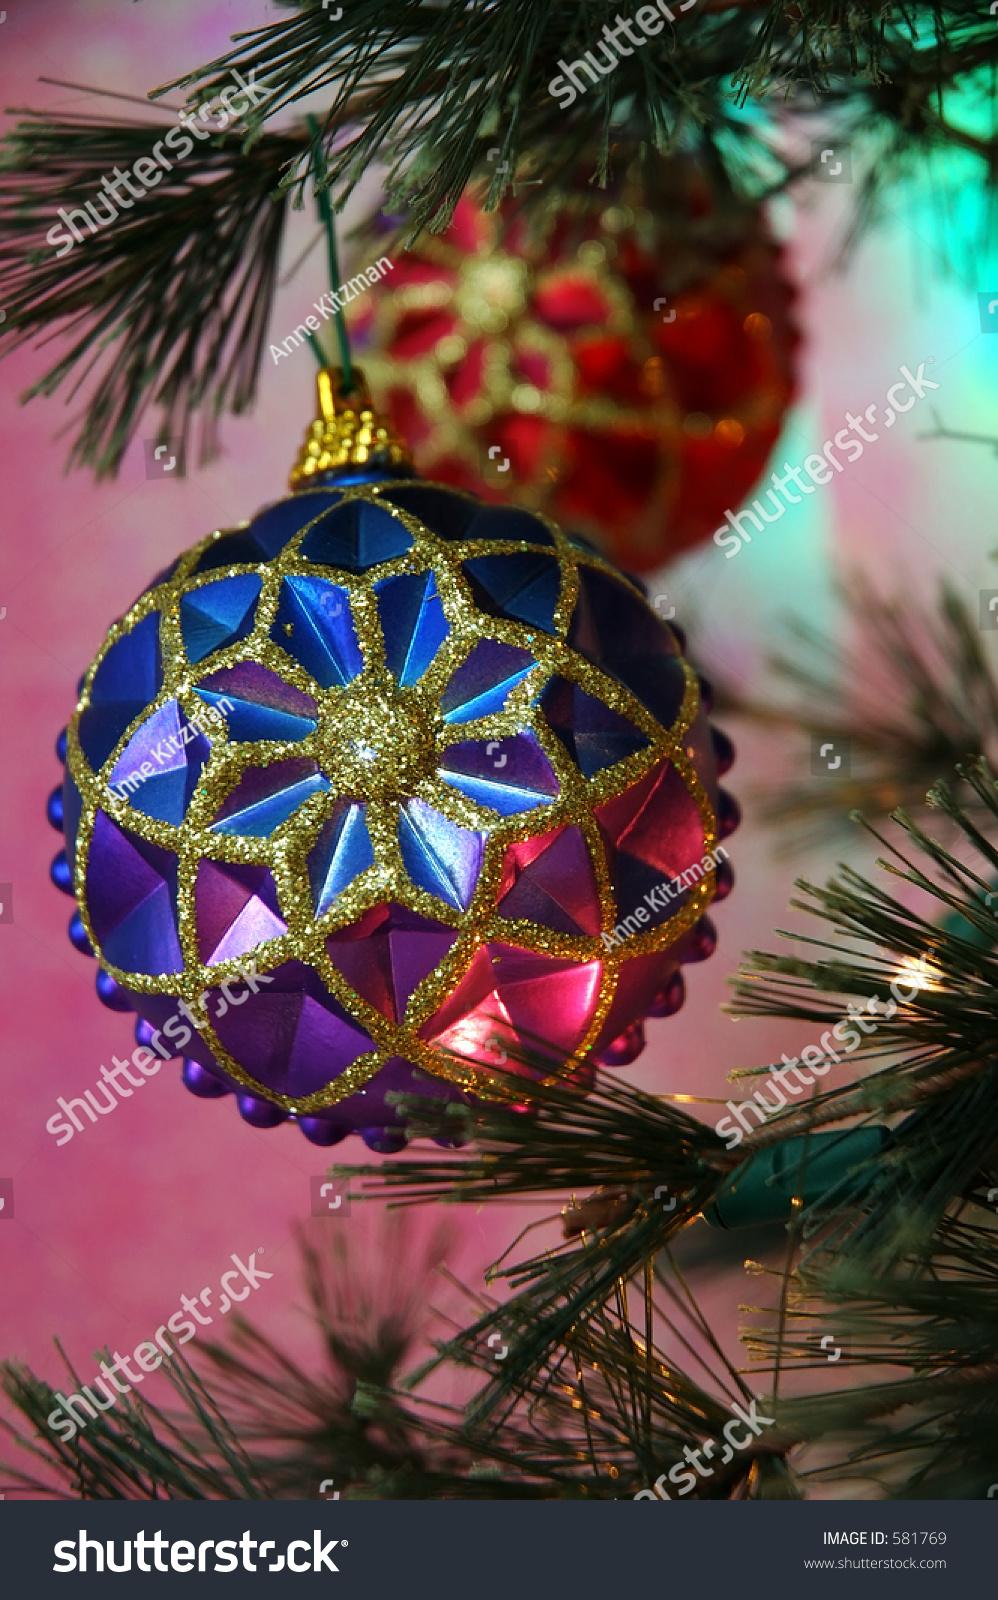 Christmas Tree Vintage Christmas Ornaments Colors Stock Photo Edit Now 581769